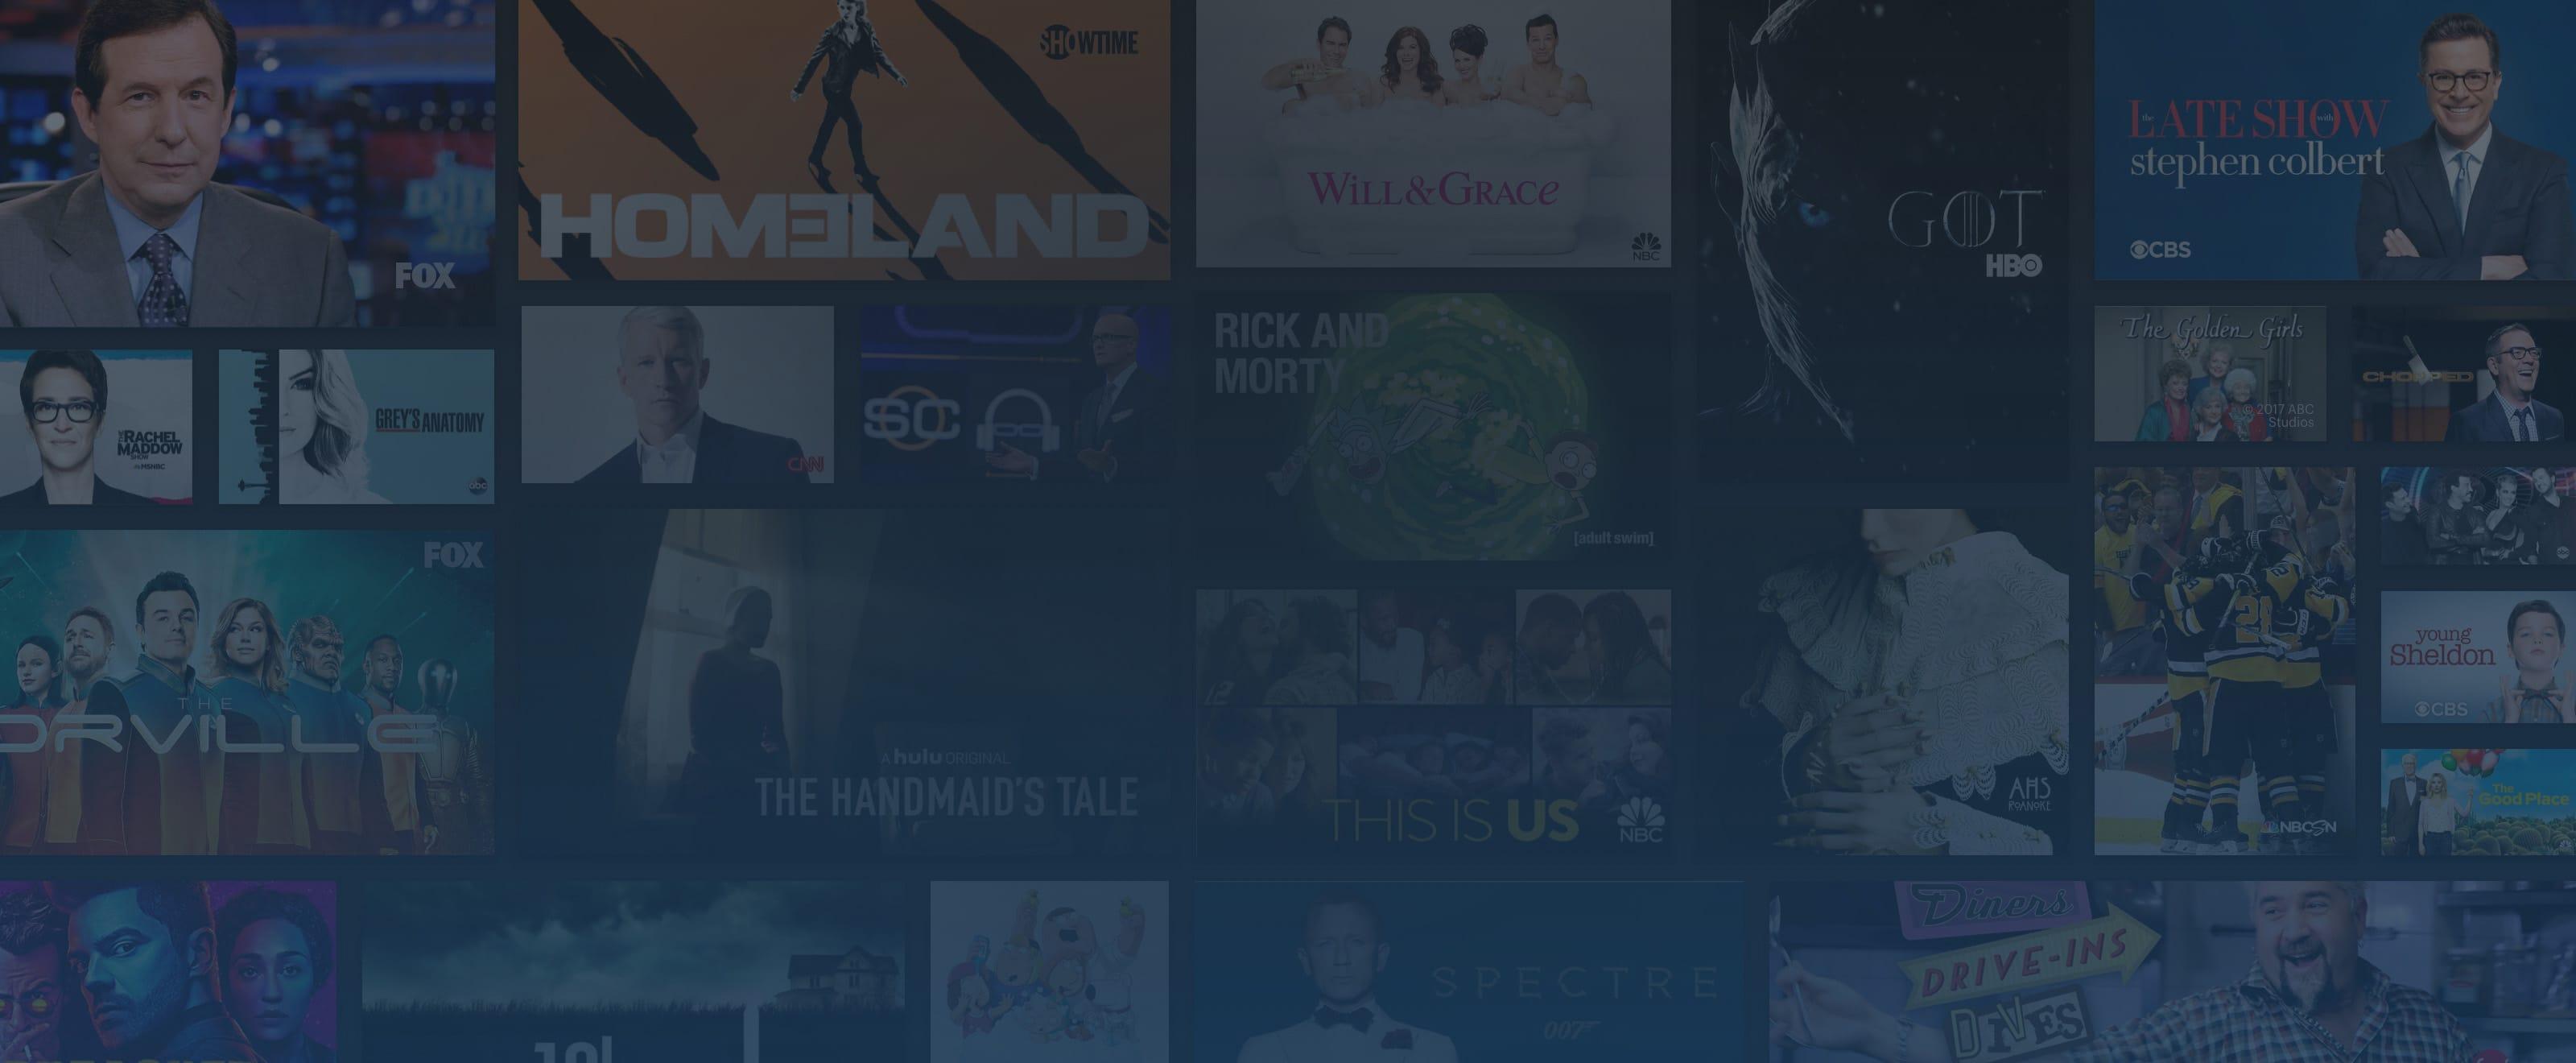 59f05d12b Watch Live TV Online - Stream Live & On-Demand | Hulu | Hulu